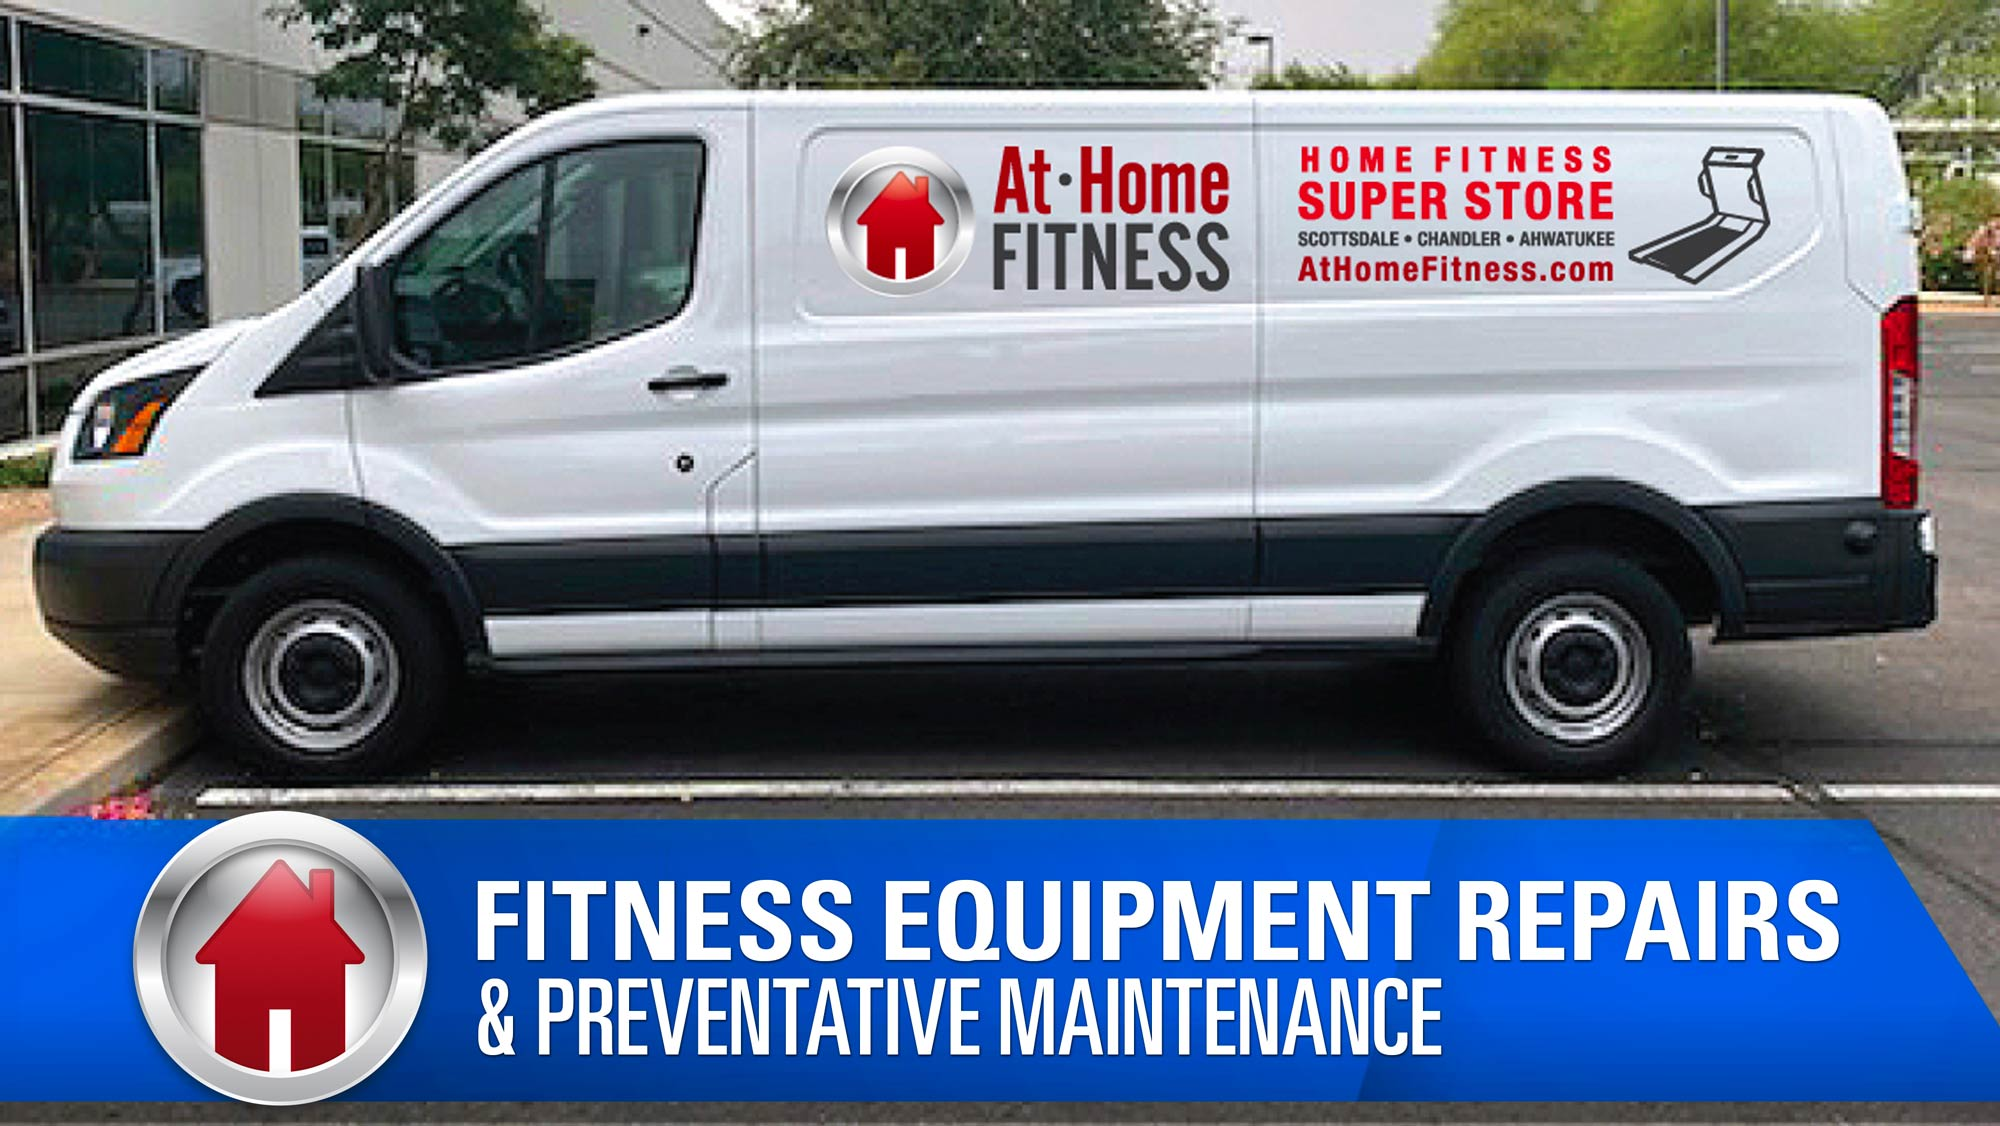 Preventative Maintenance and Fitness Equipment Repairs